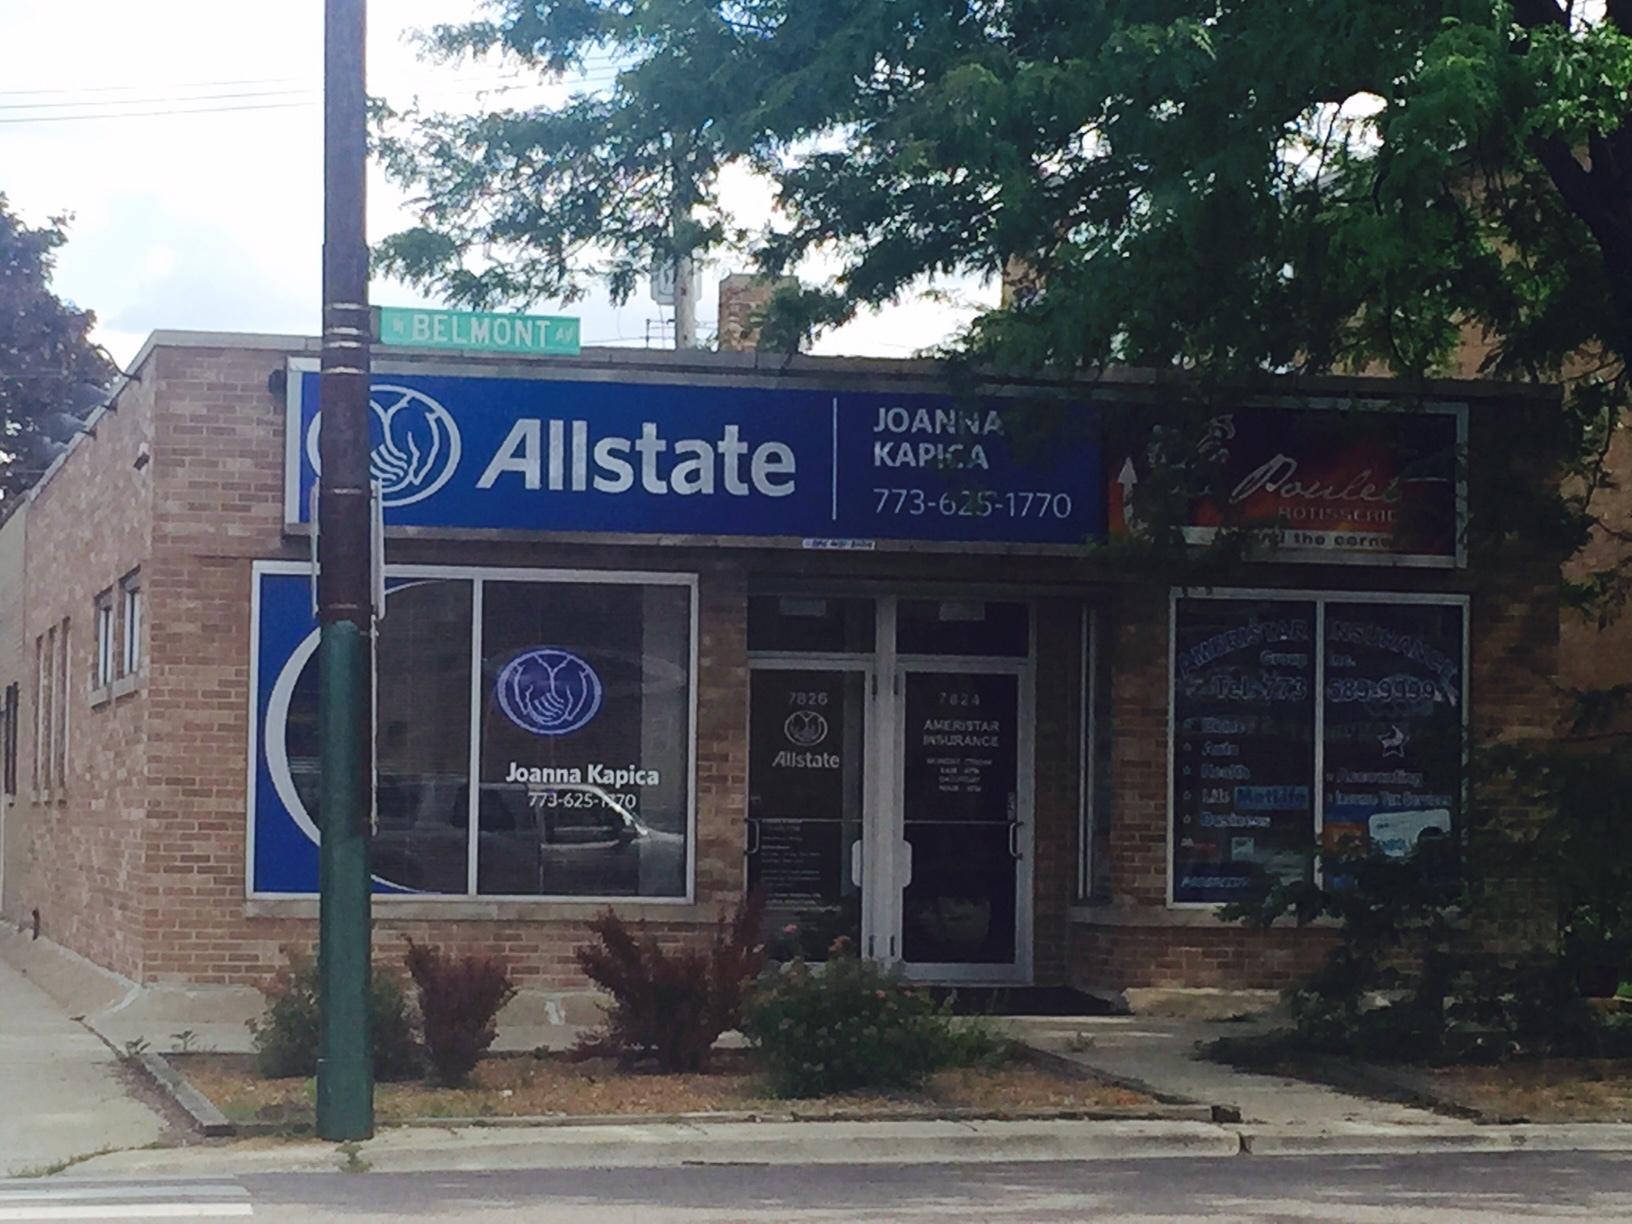 Joanna Kapica: Allstate Insurance